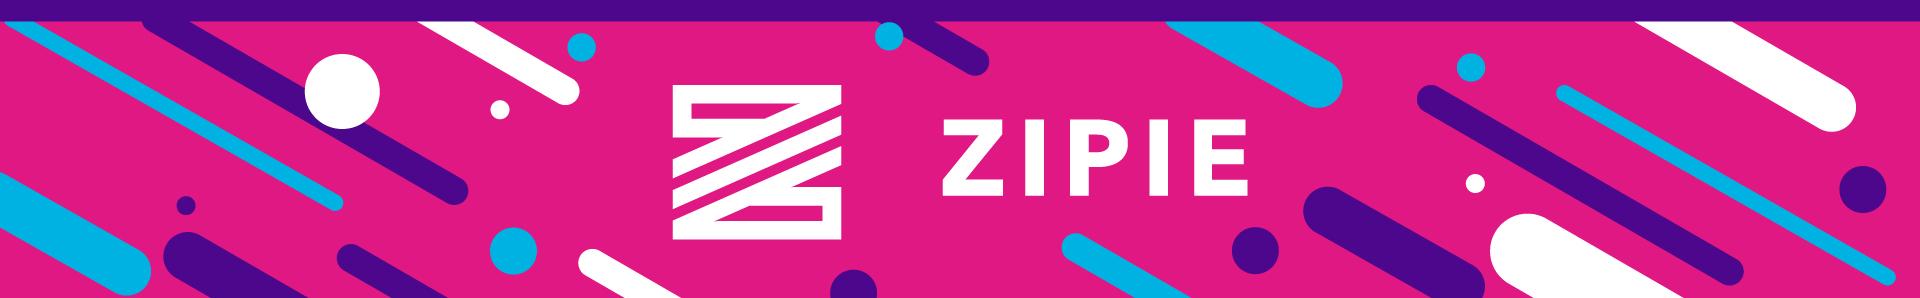 _200323_Zipie_MarketingInCrisis_LandingPage_DesktopFooter_RFU